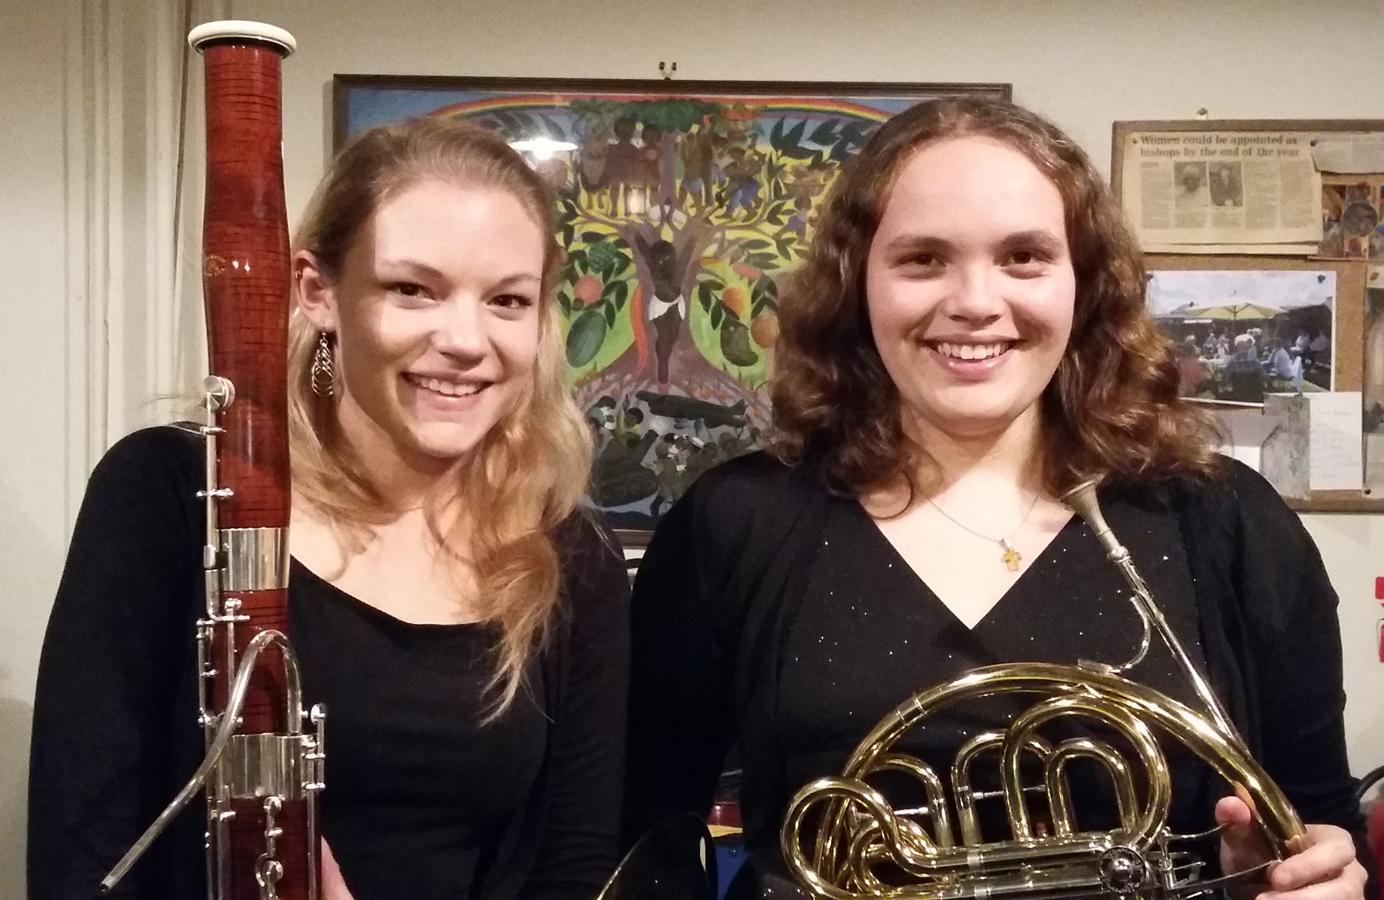 Guylaine Eckersley and Lizzy Nightingale - September 2015